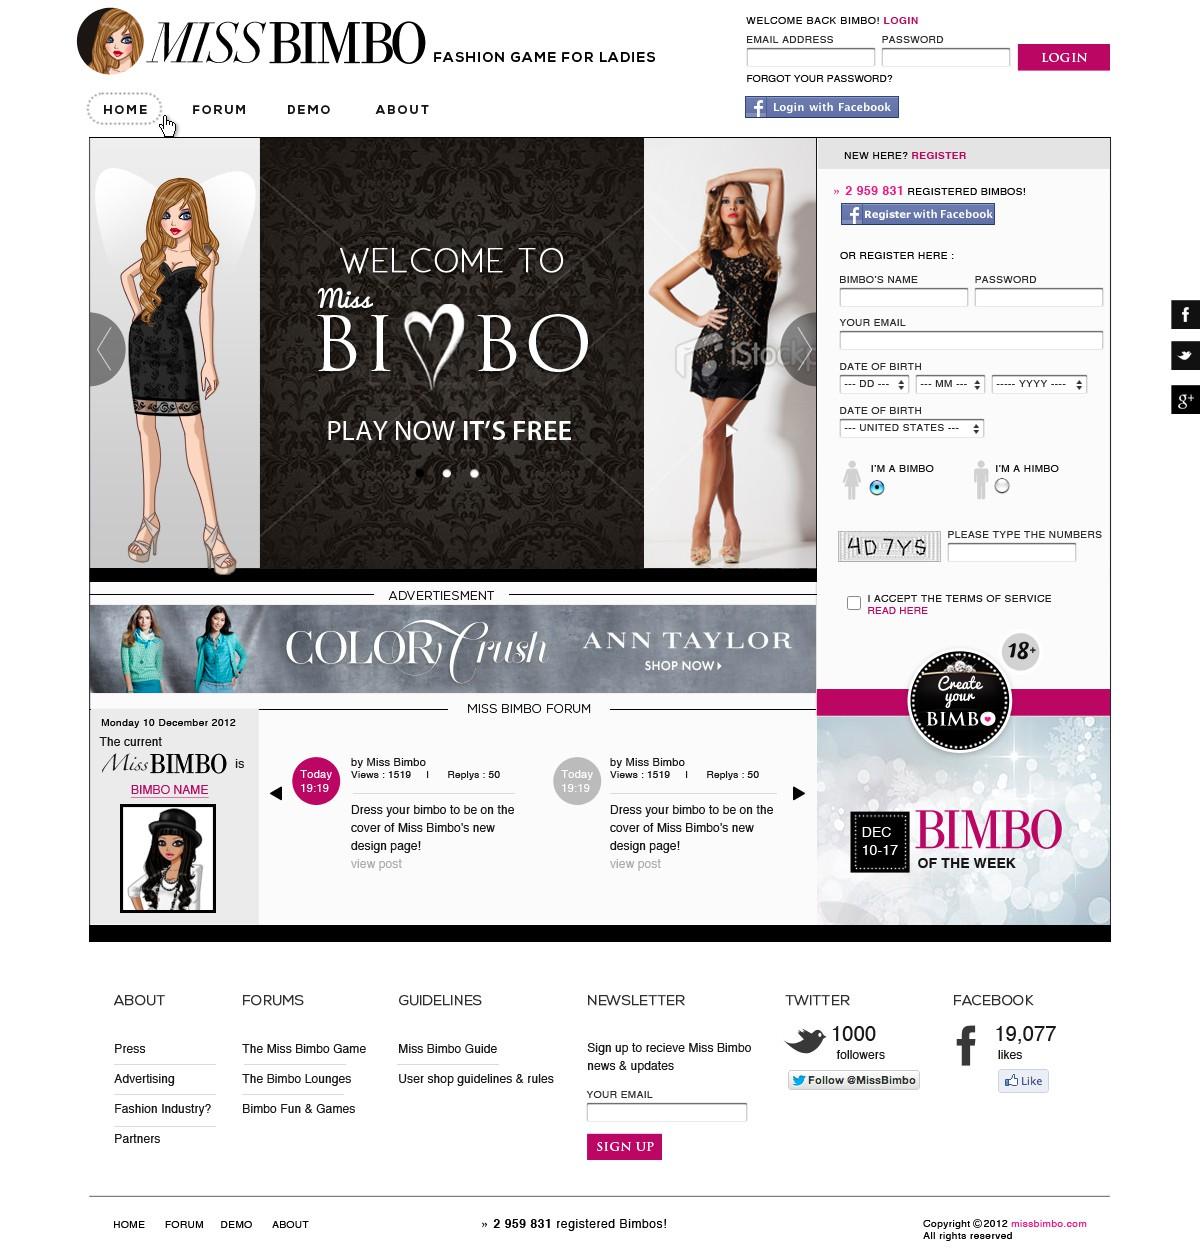 Miss Bimbo.com - edgy cool design wanted!